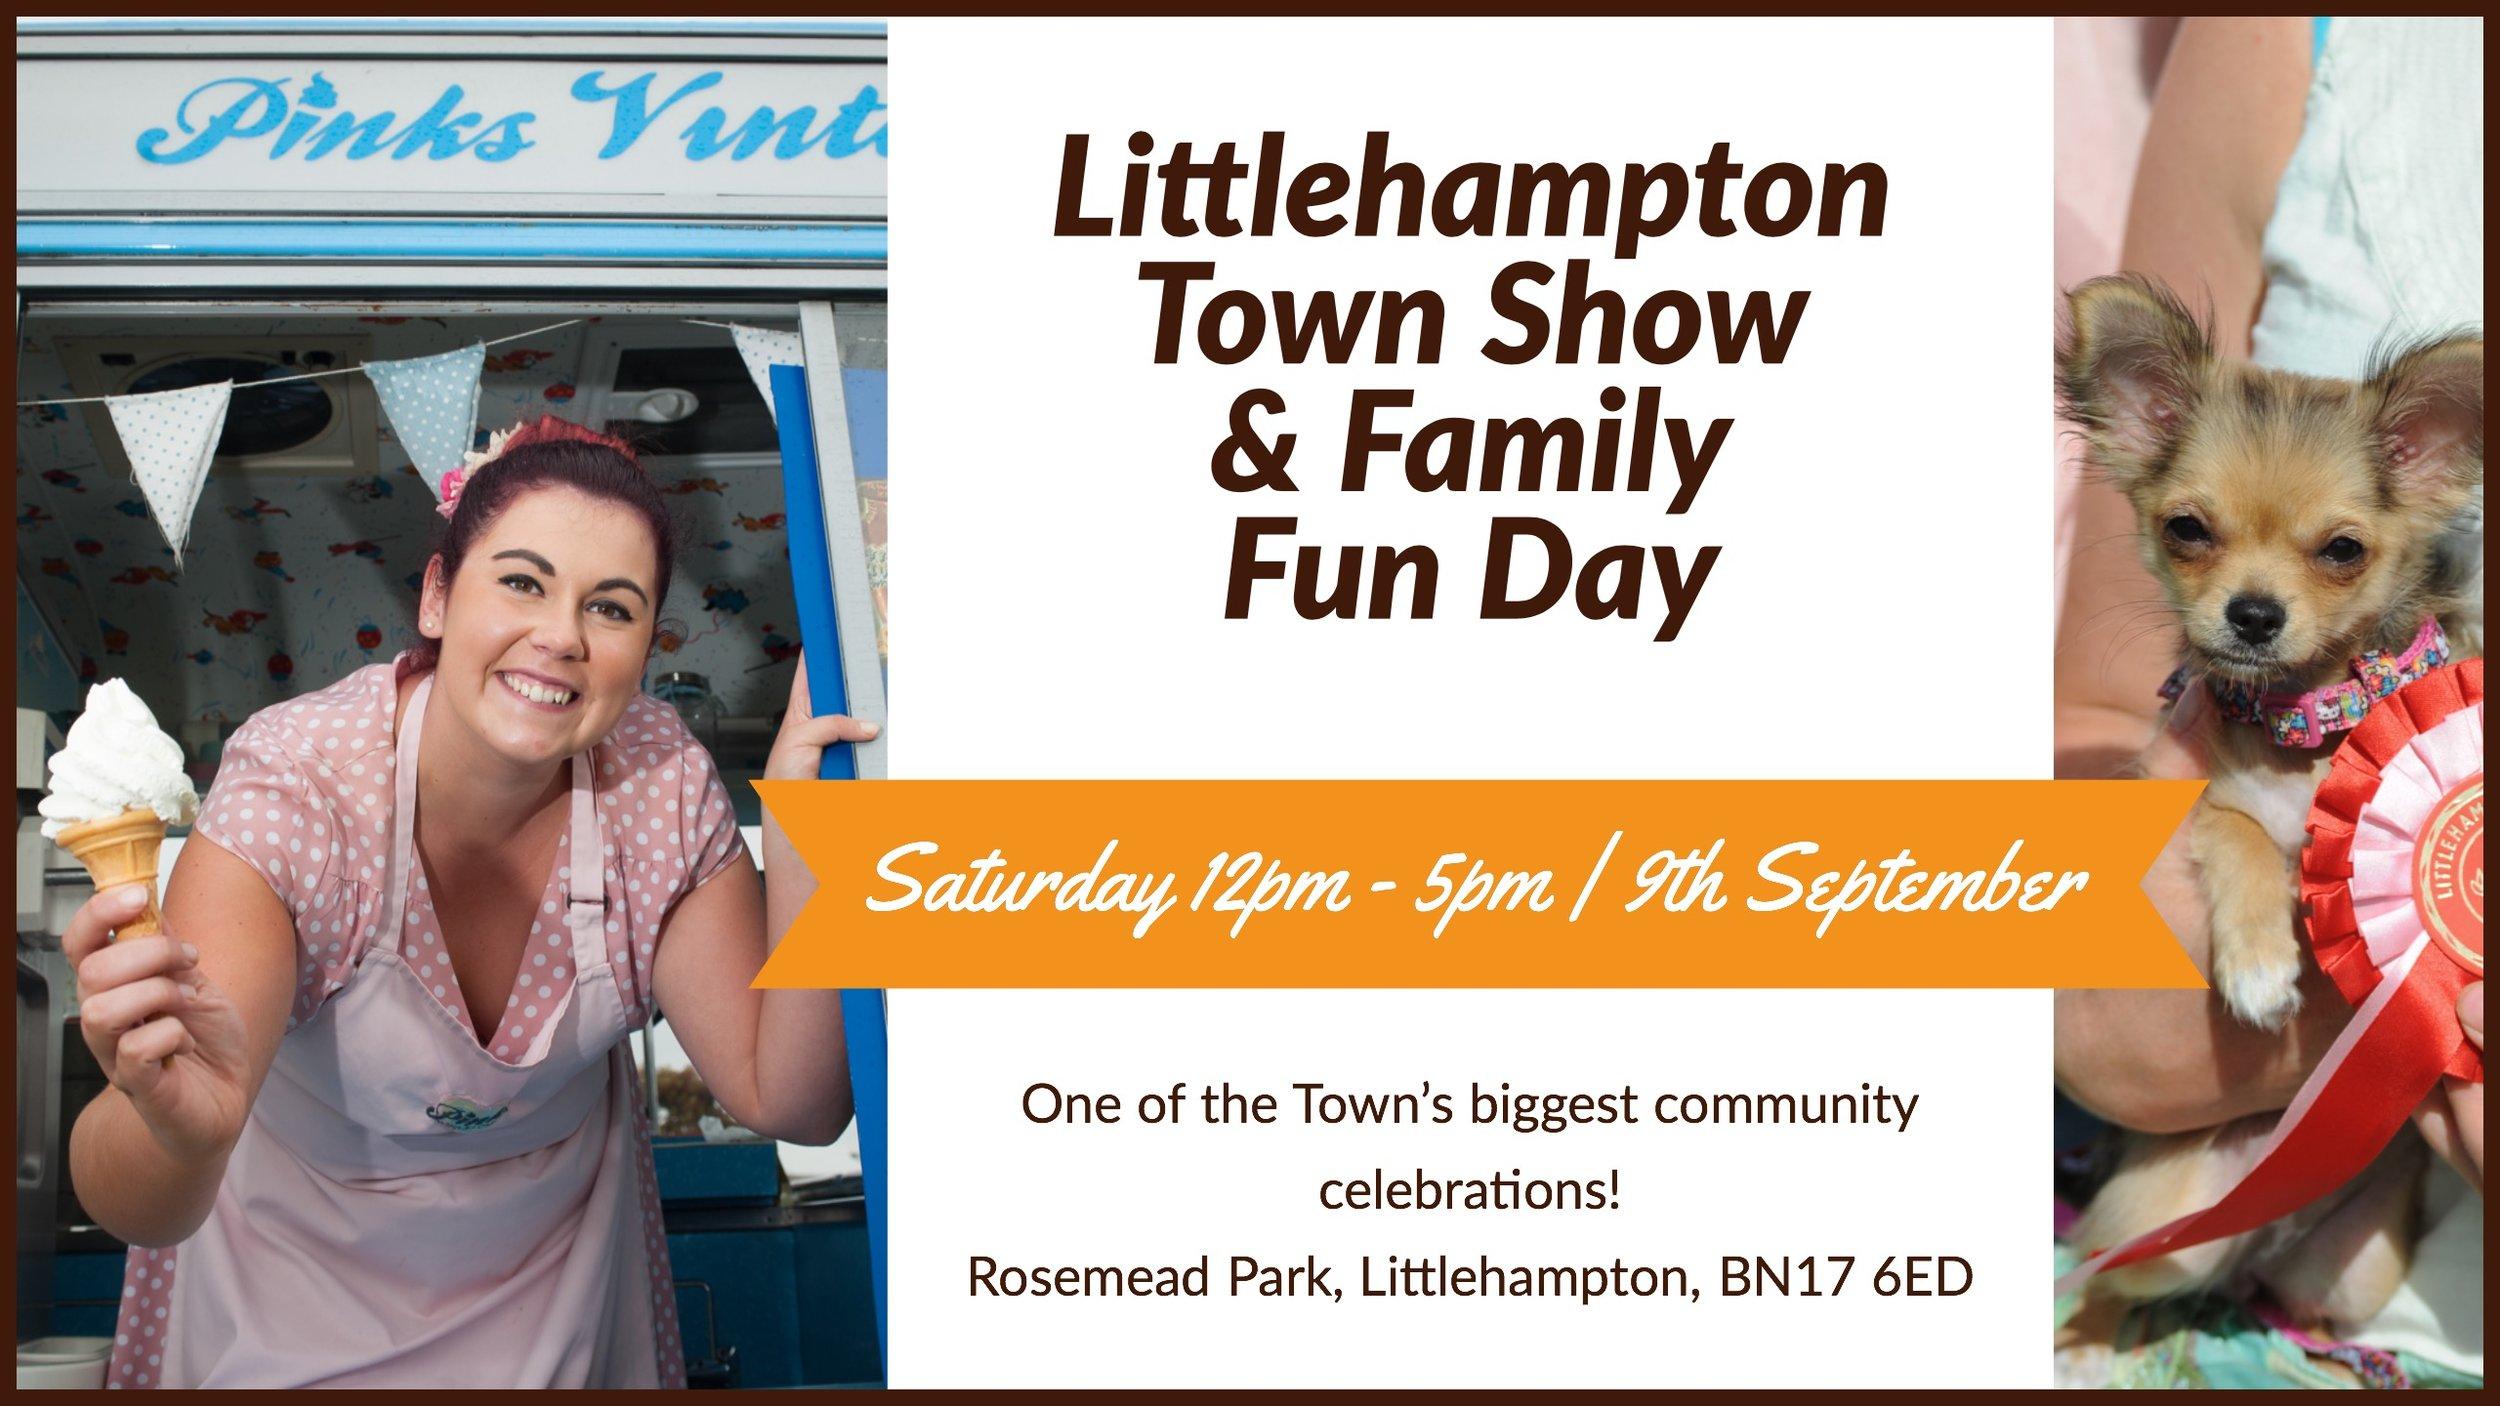 Littlehampton Town Show & Family Fun Day